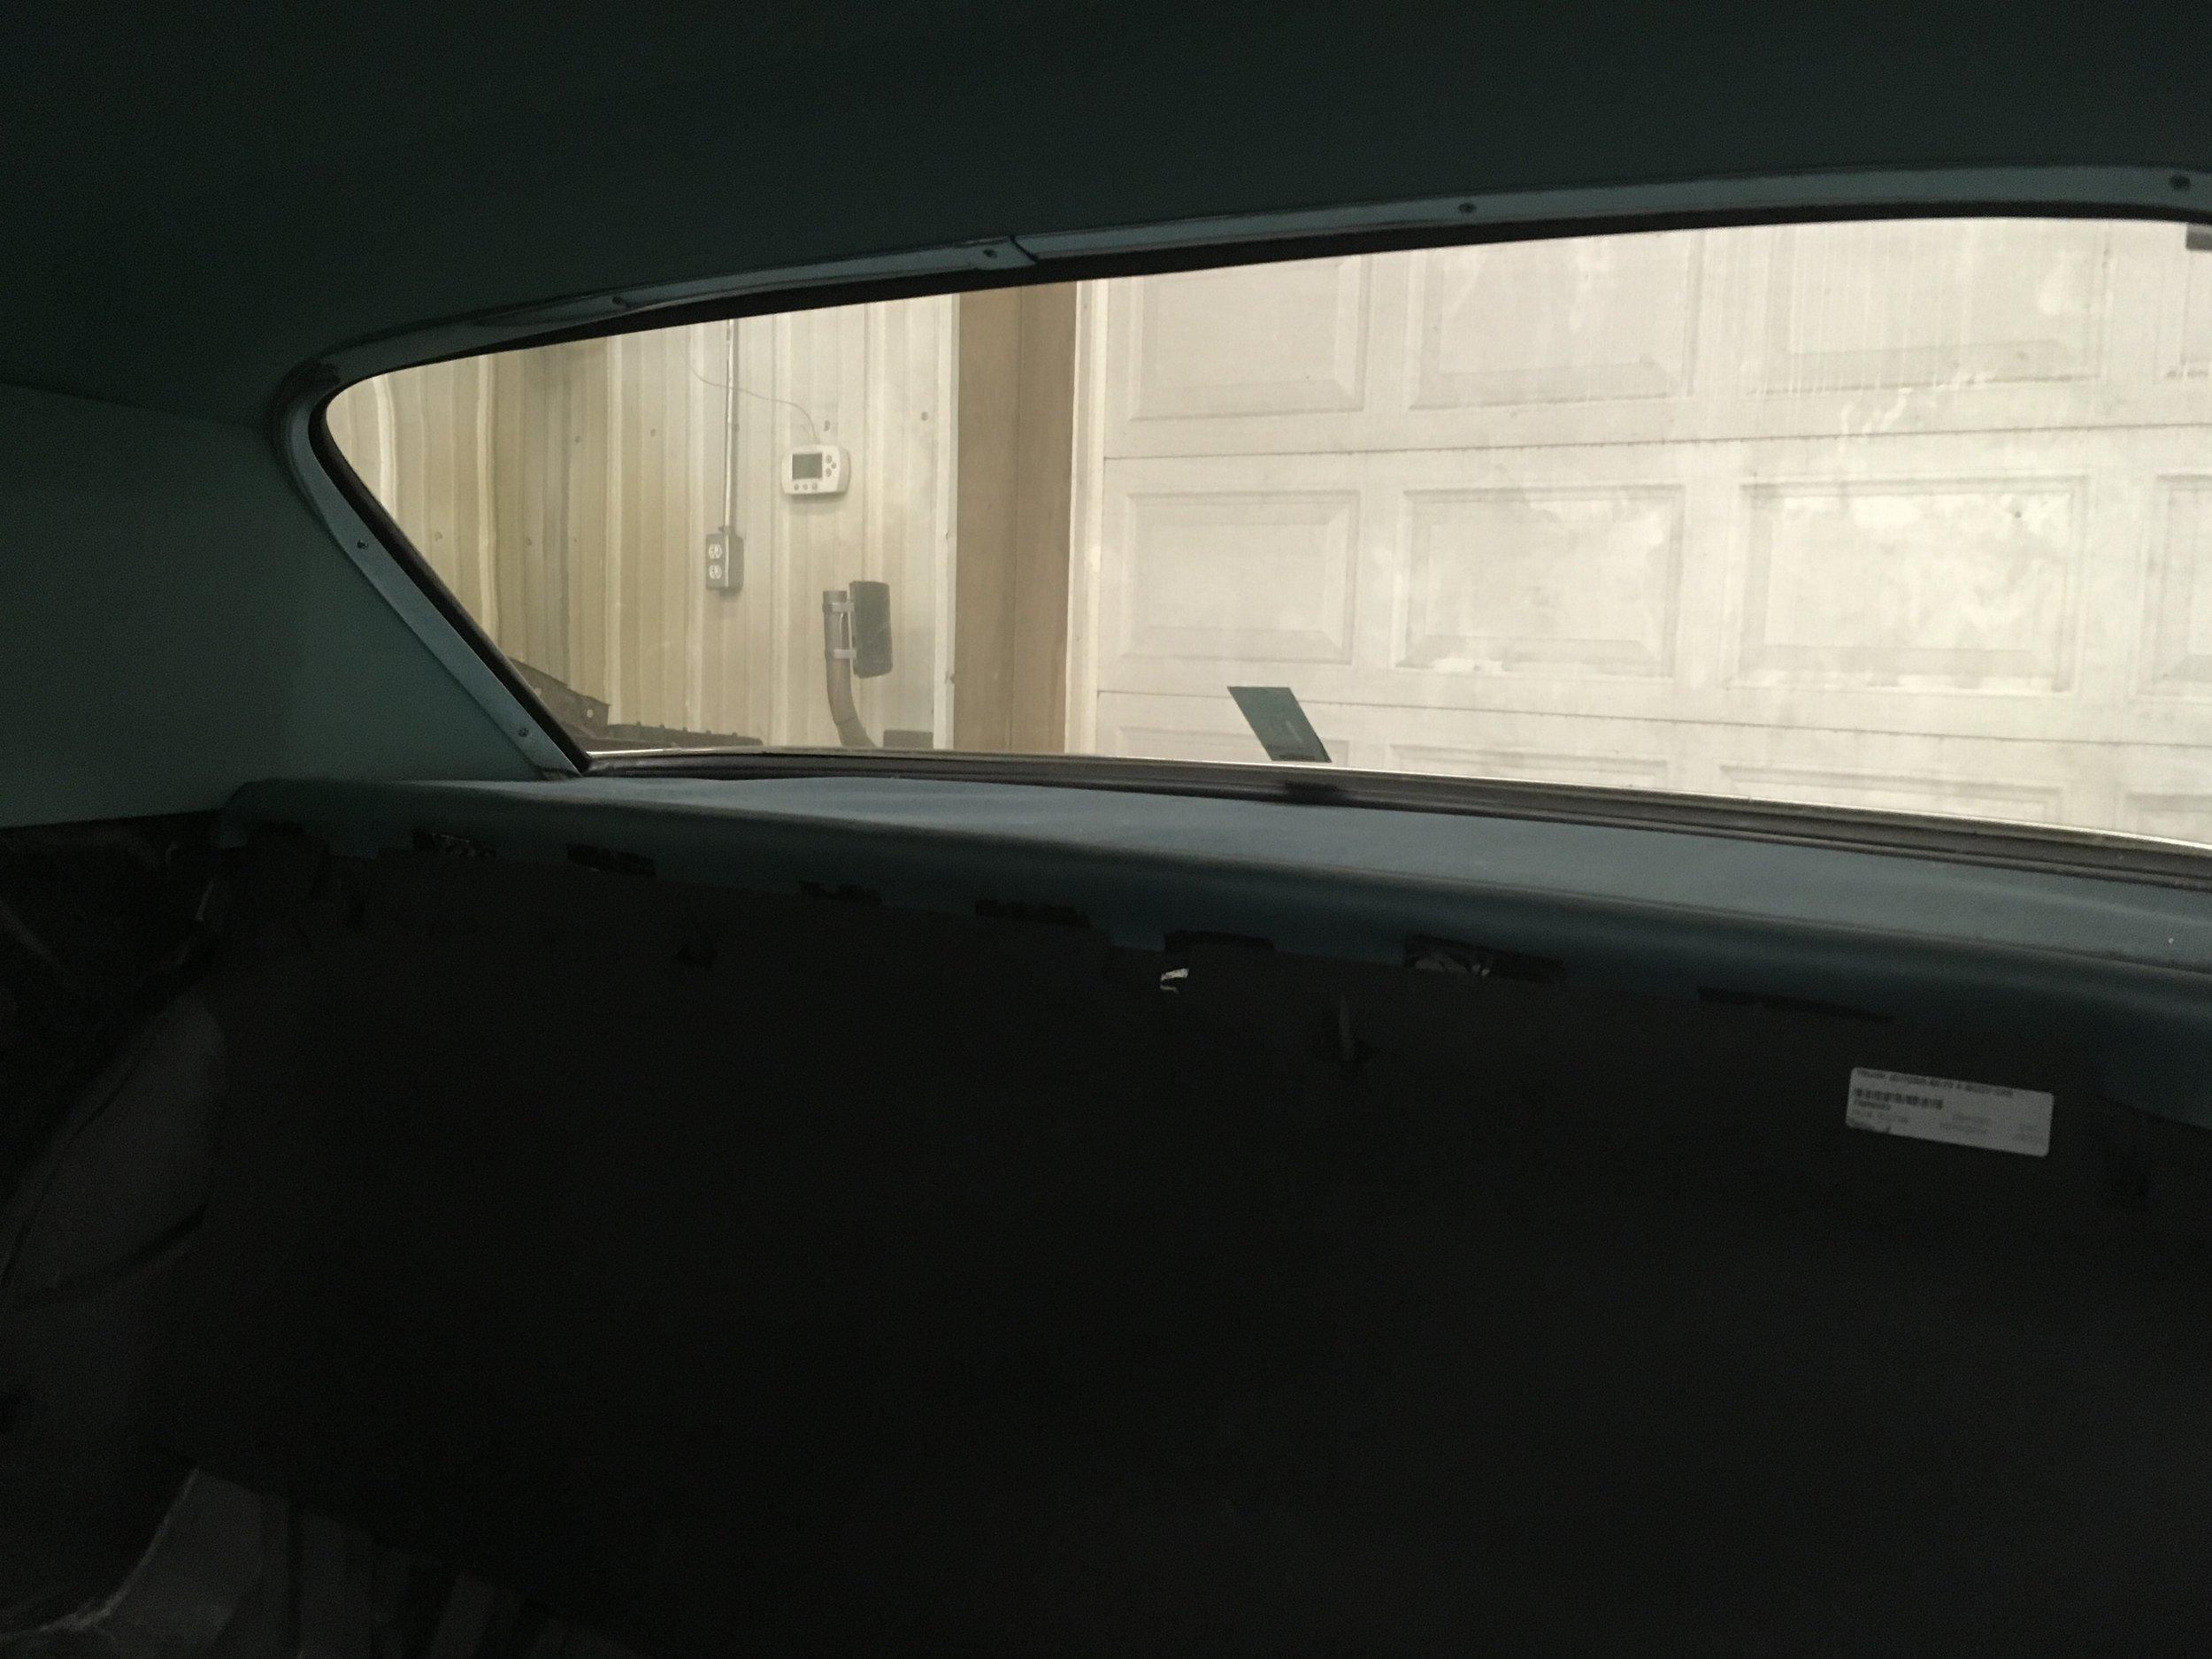 1962-Pontiac-Bonneville-minneapolis-hot-rod-custom-build-restoration-rear-windshield.jpg